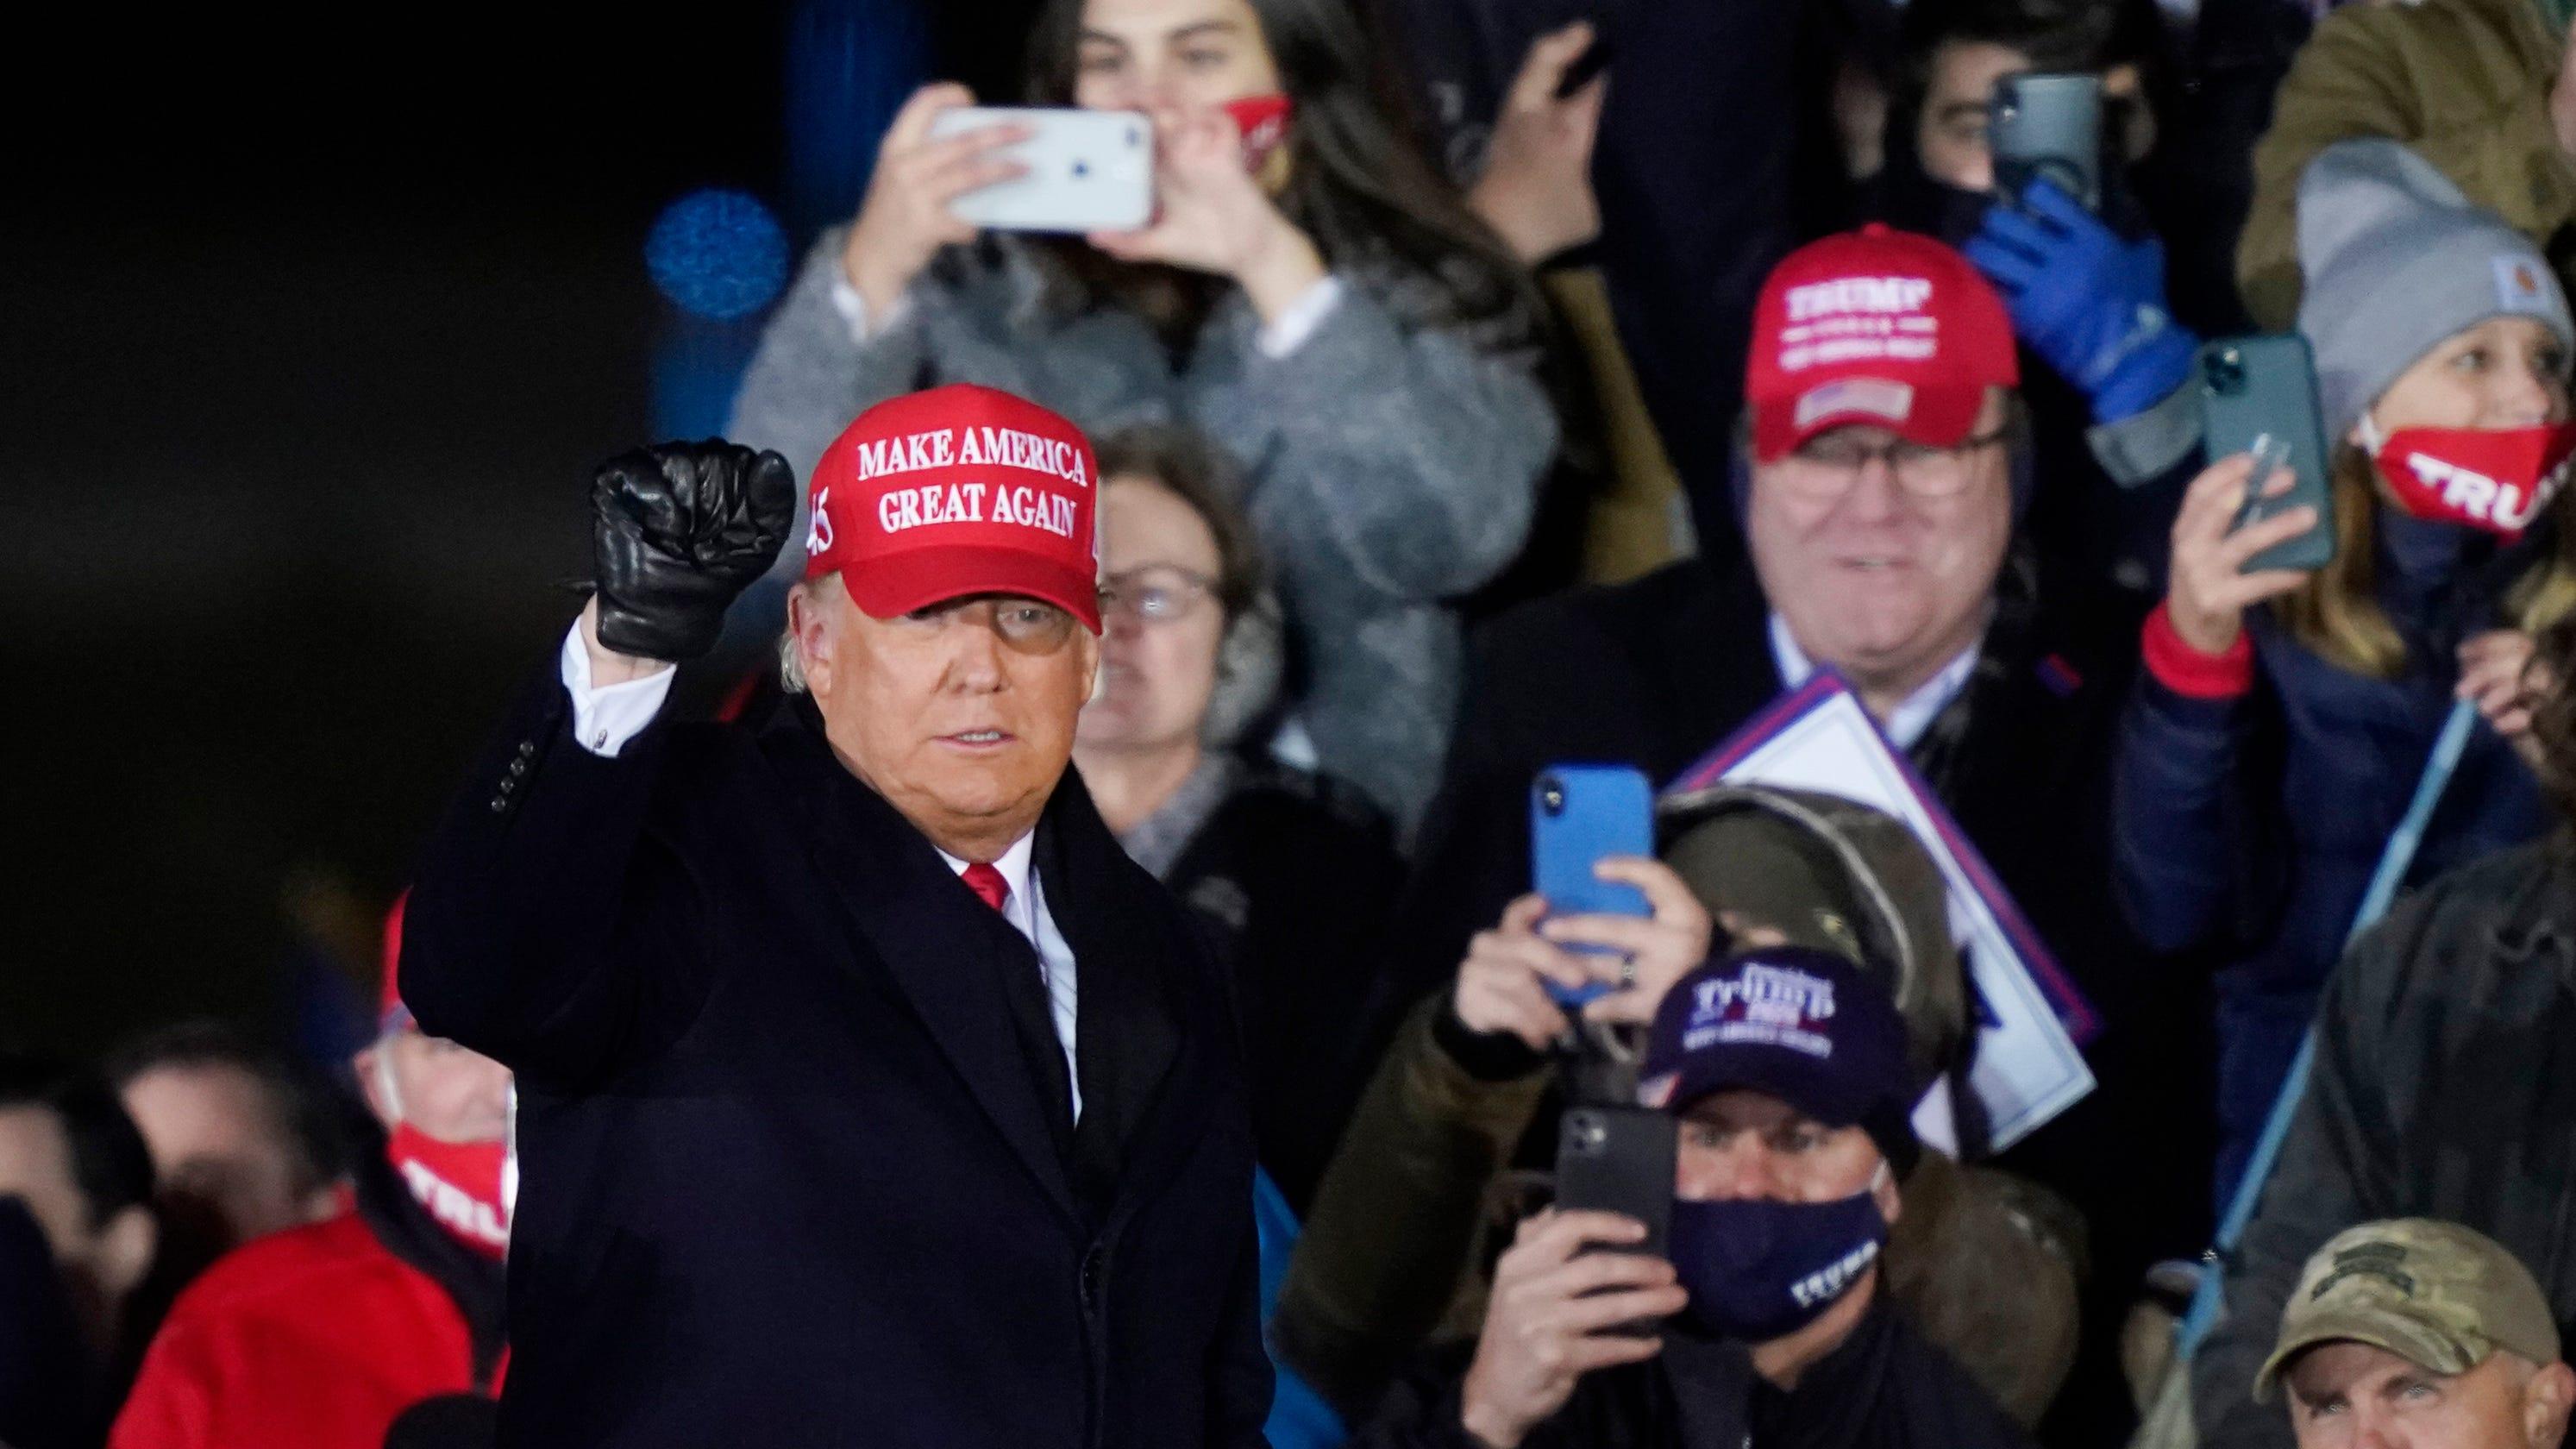 Trump keeps misleading on 2020 election, pressures Michigan Senate